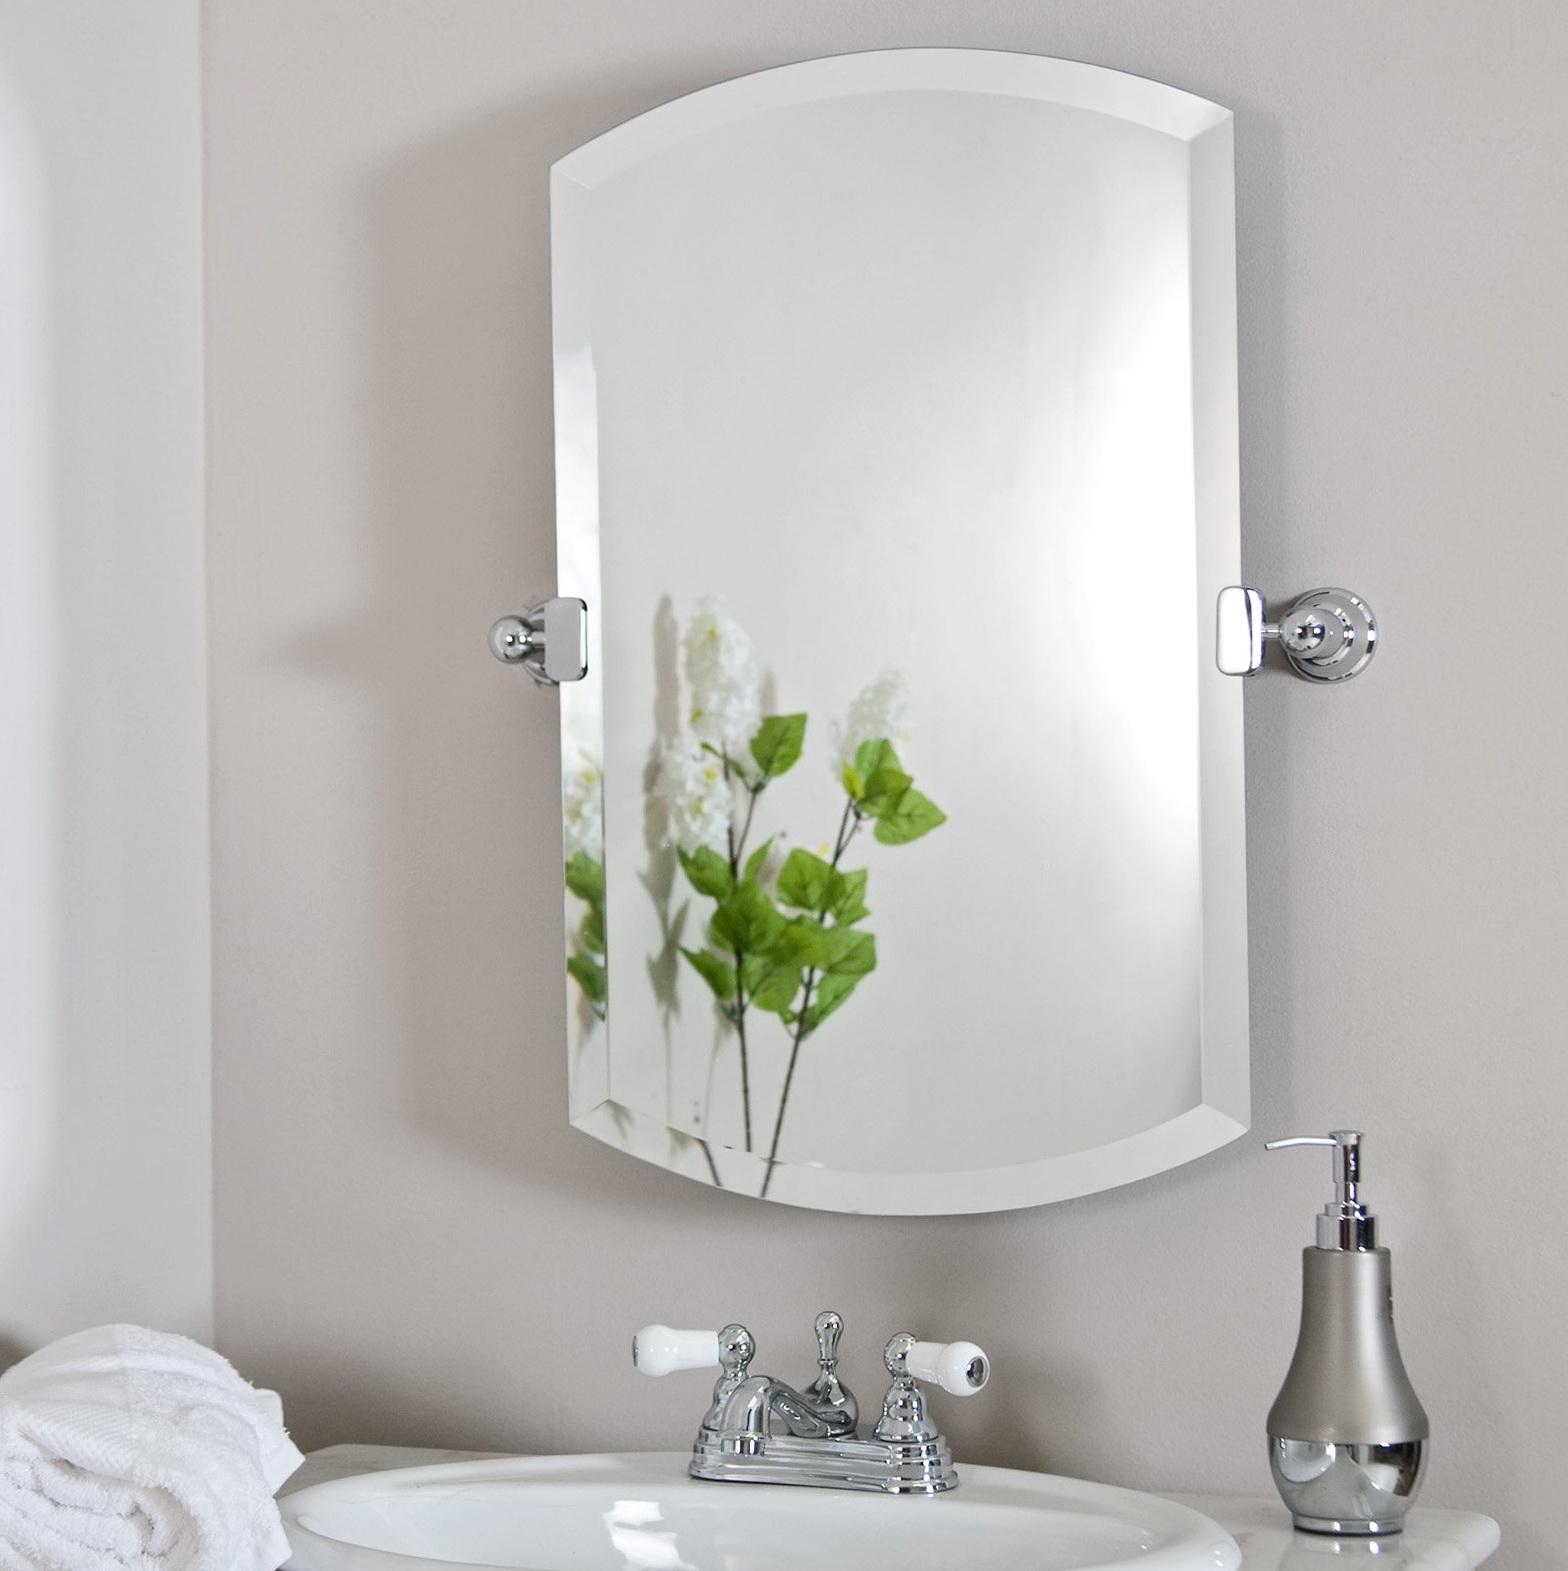 Unique Bathroom Mirrors For Sale Home Design Ideas